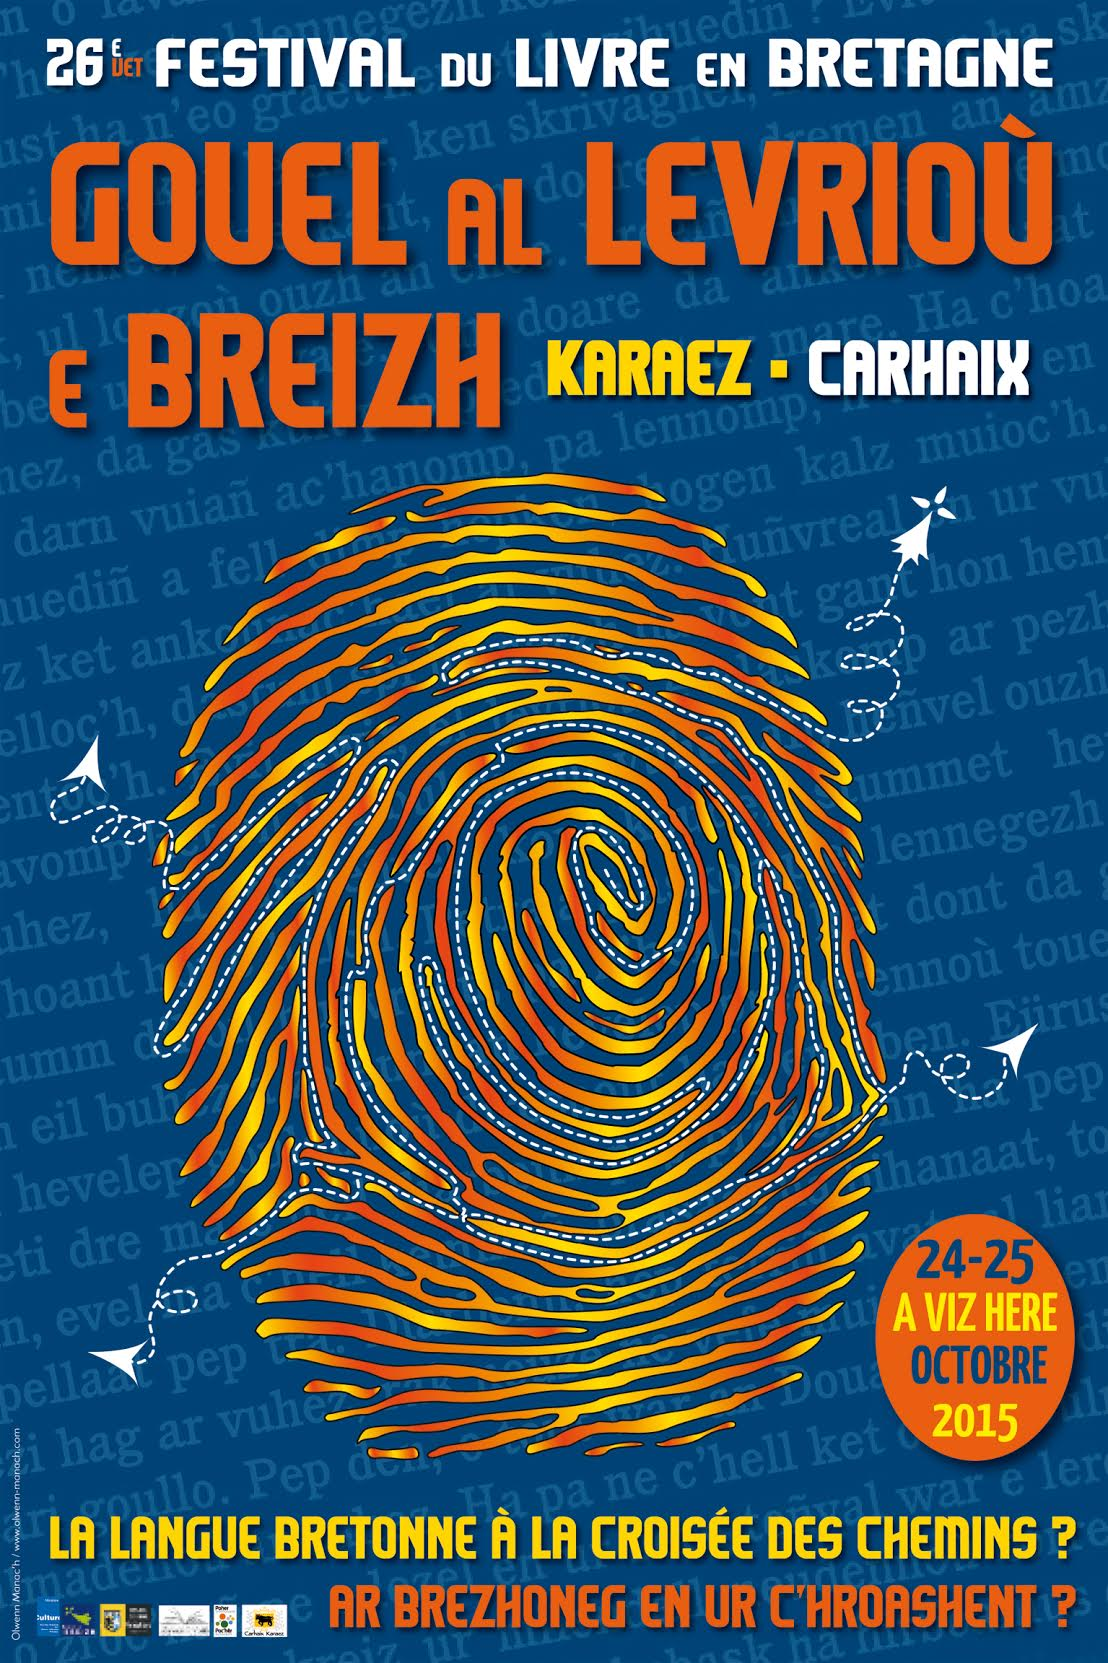 http://www.festivaldulivre-carhaix.org/wp/wp-content/uploads/2015/06/glb_affiche_2015.jpg